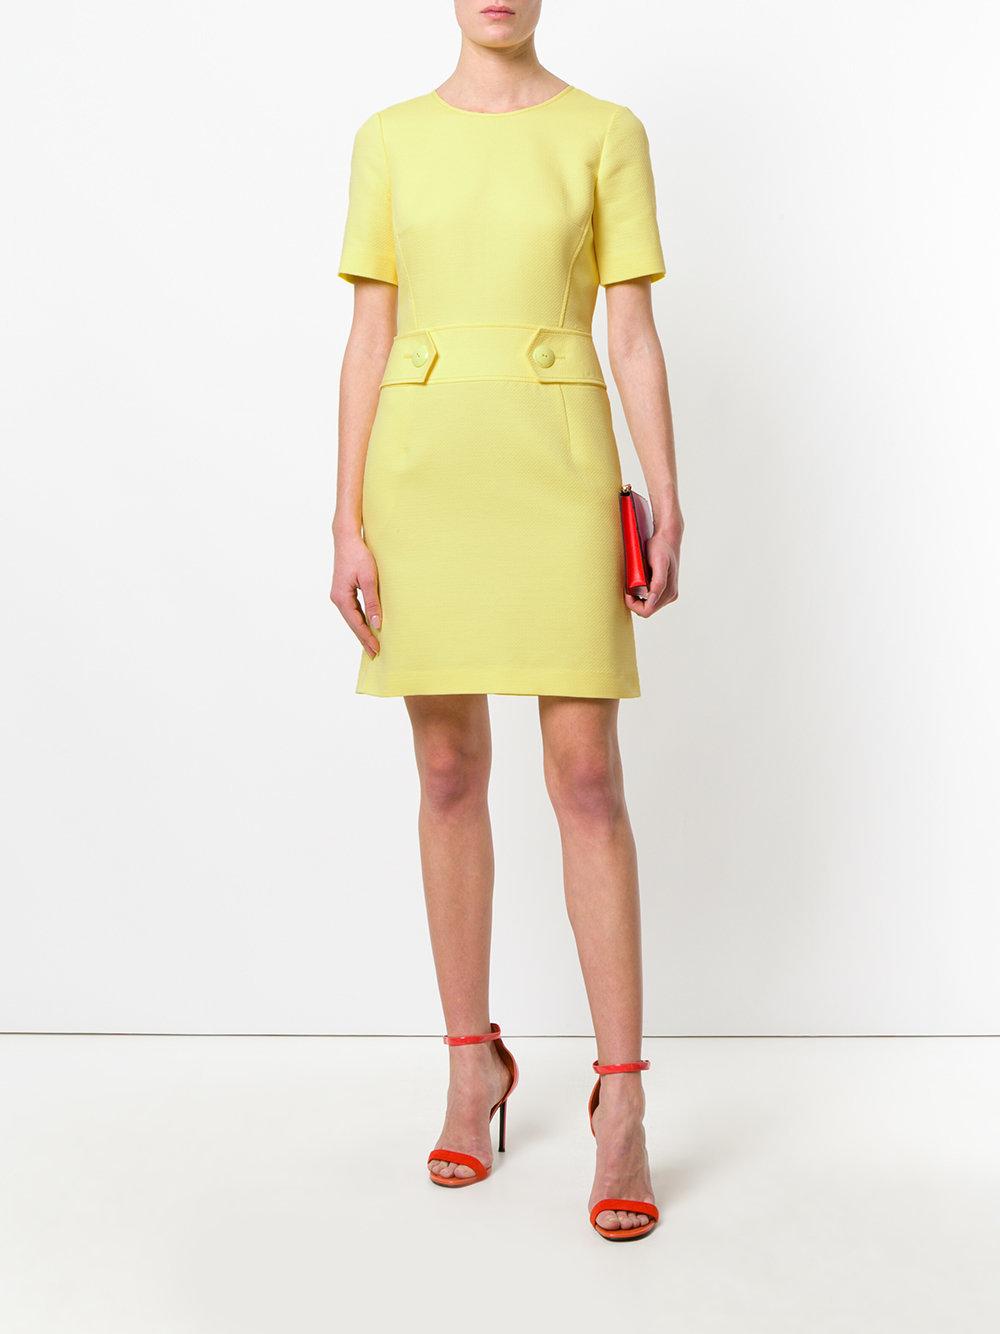 12682187a8e ... Желтое мини-платье шифт из хлопка и шелка от Emilio Pucci(Эмилио Пуччи)